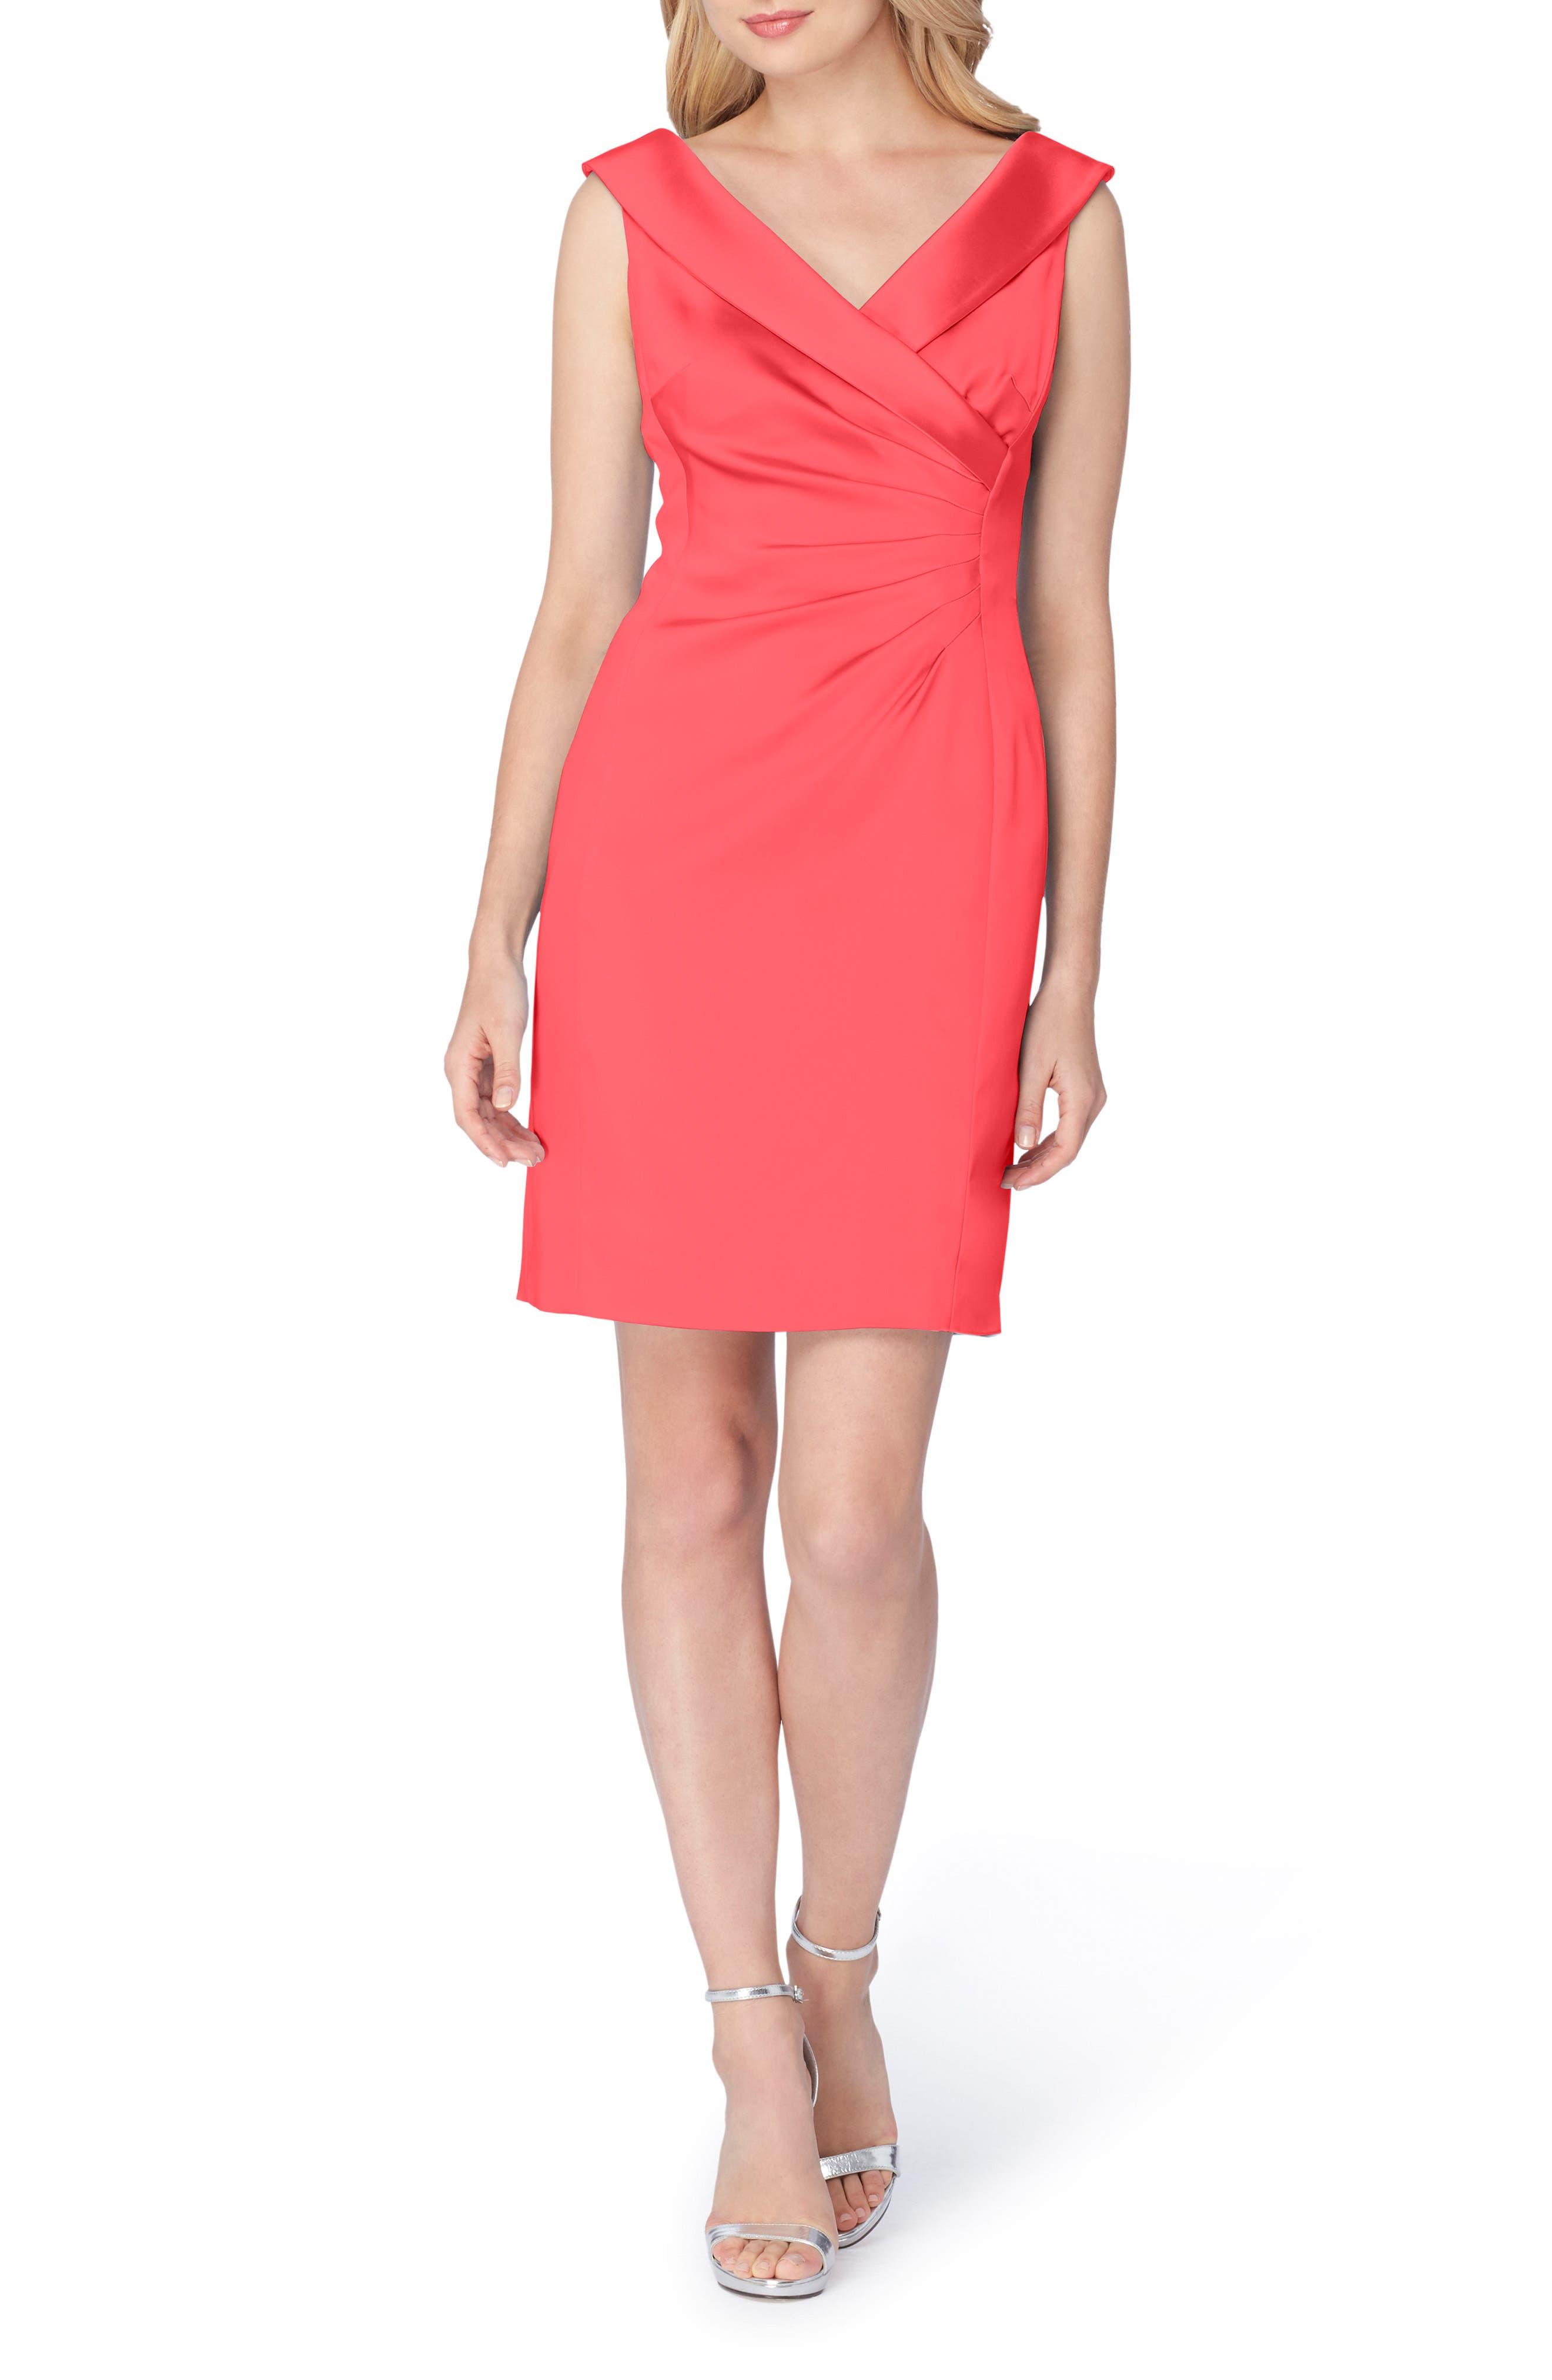 Alternate Image 1 Selected - Tahari Satin Sheath Dress (Regular & Petite)